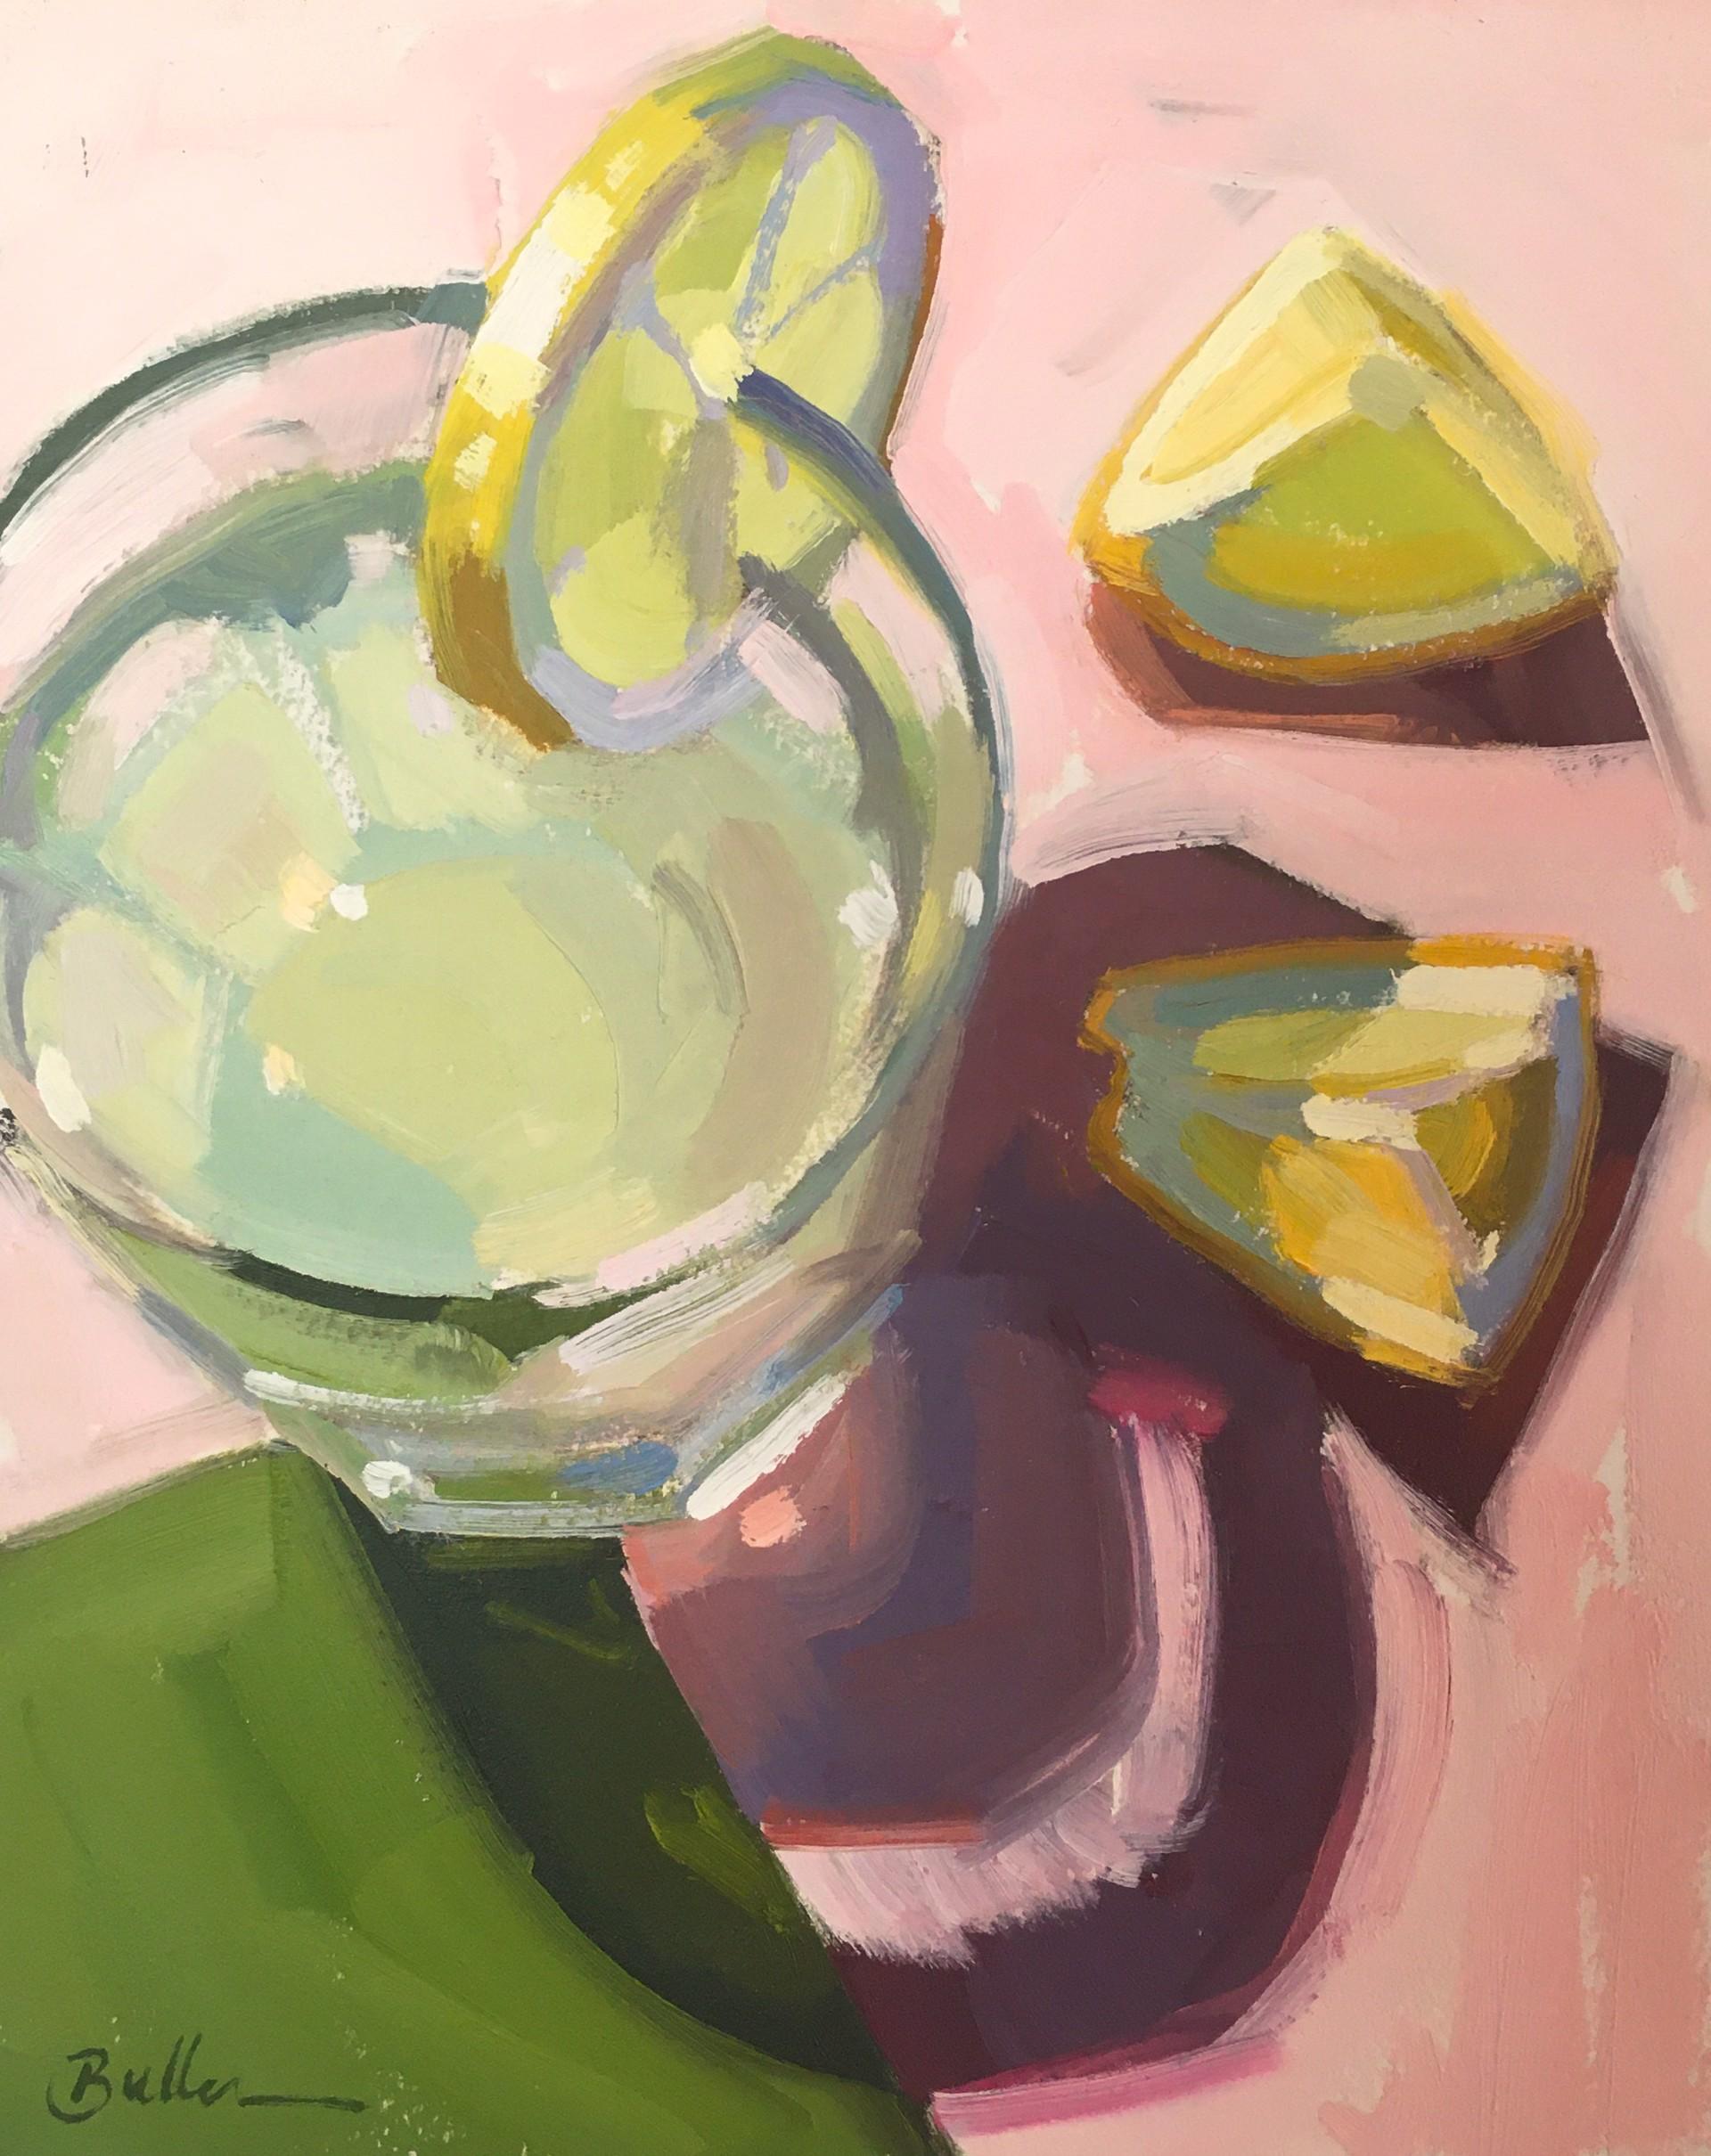 Summertime Cocktail by Samantha Buller